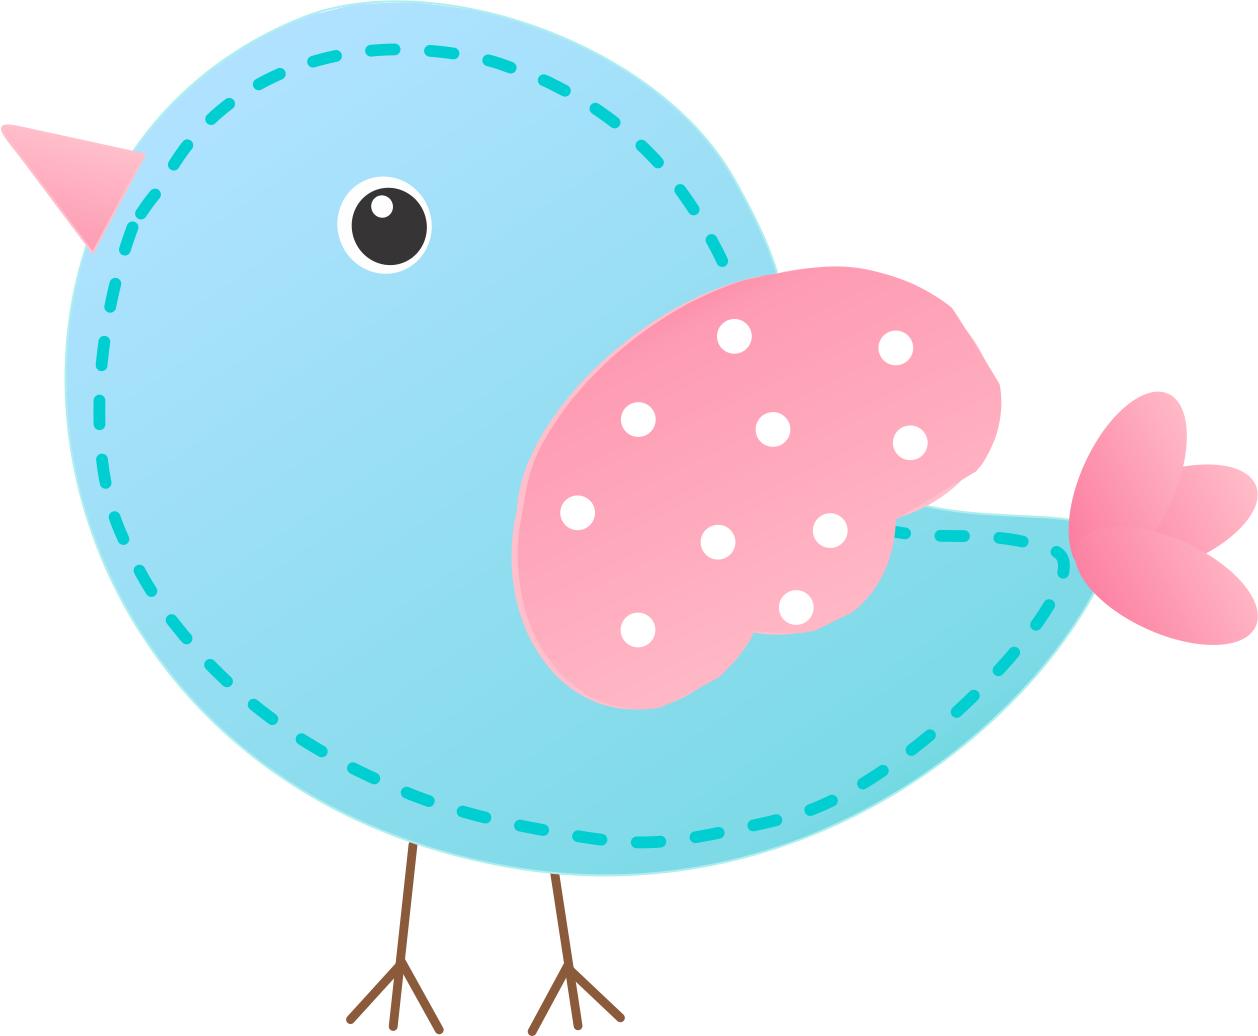 Oh My Quinceaneras Beauty Birds Singing Clipart Clip Art Cute Birds Crafts